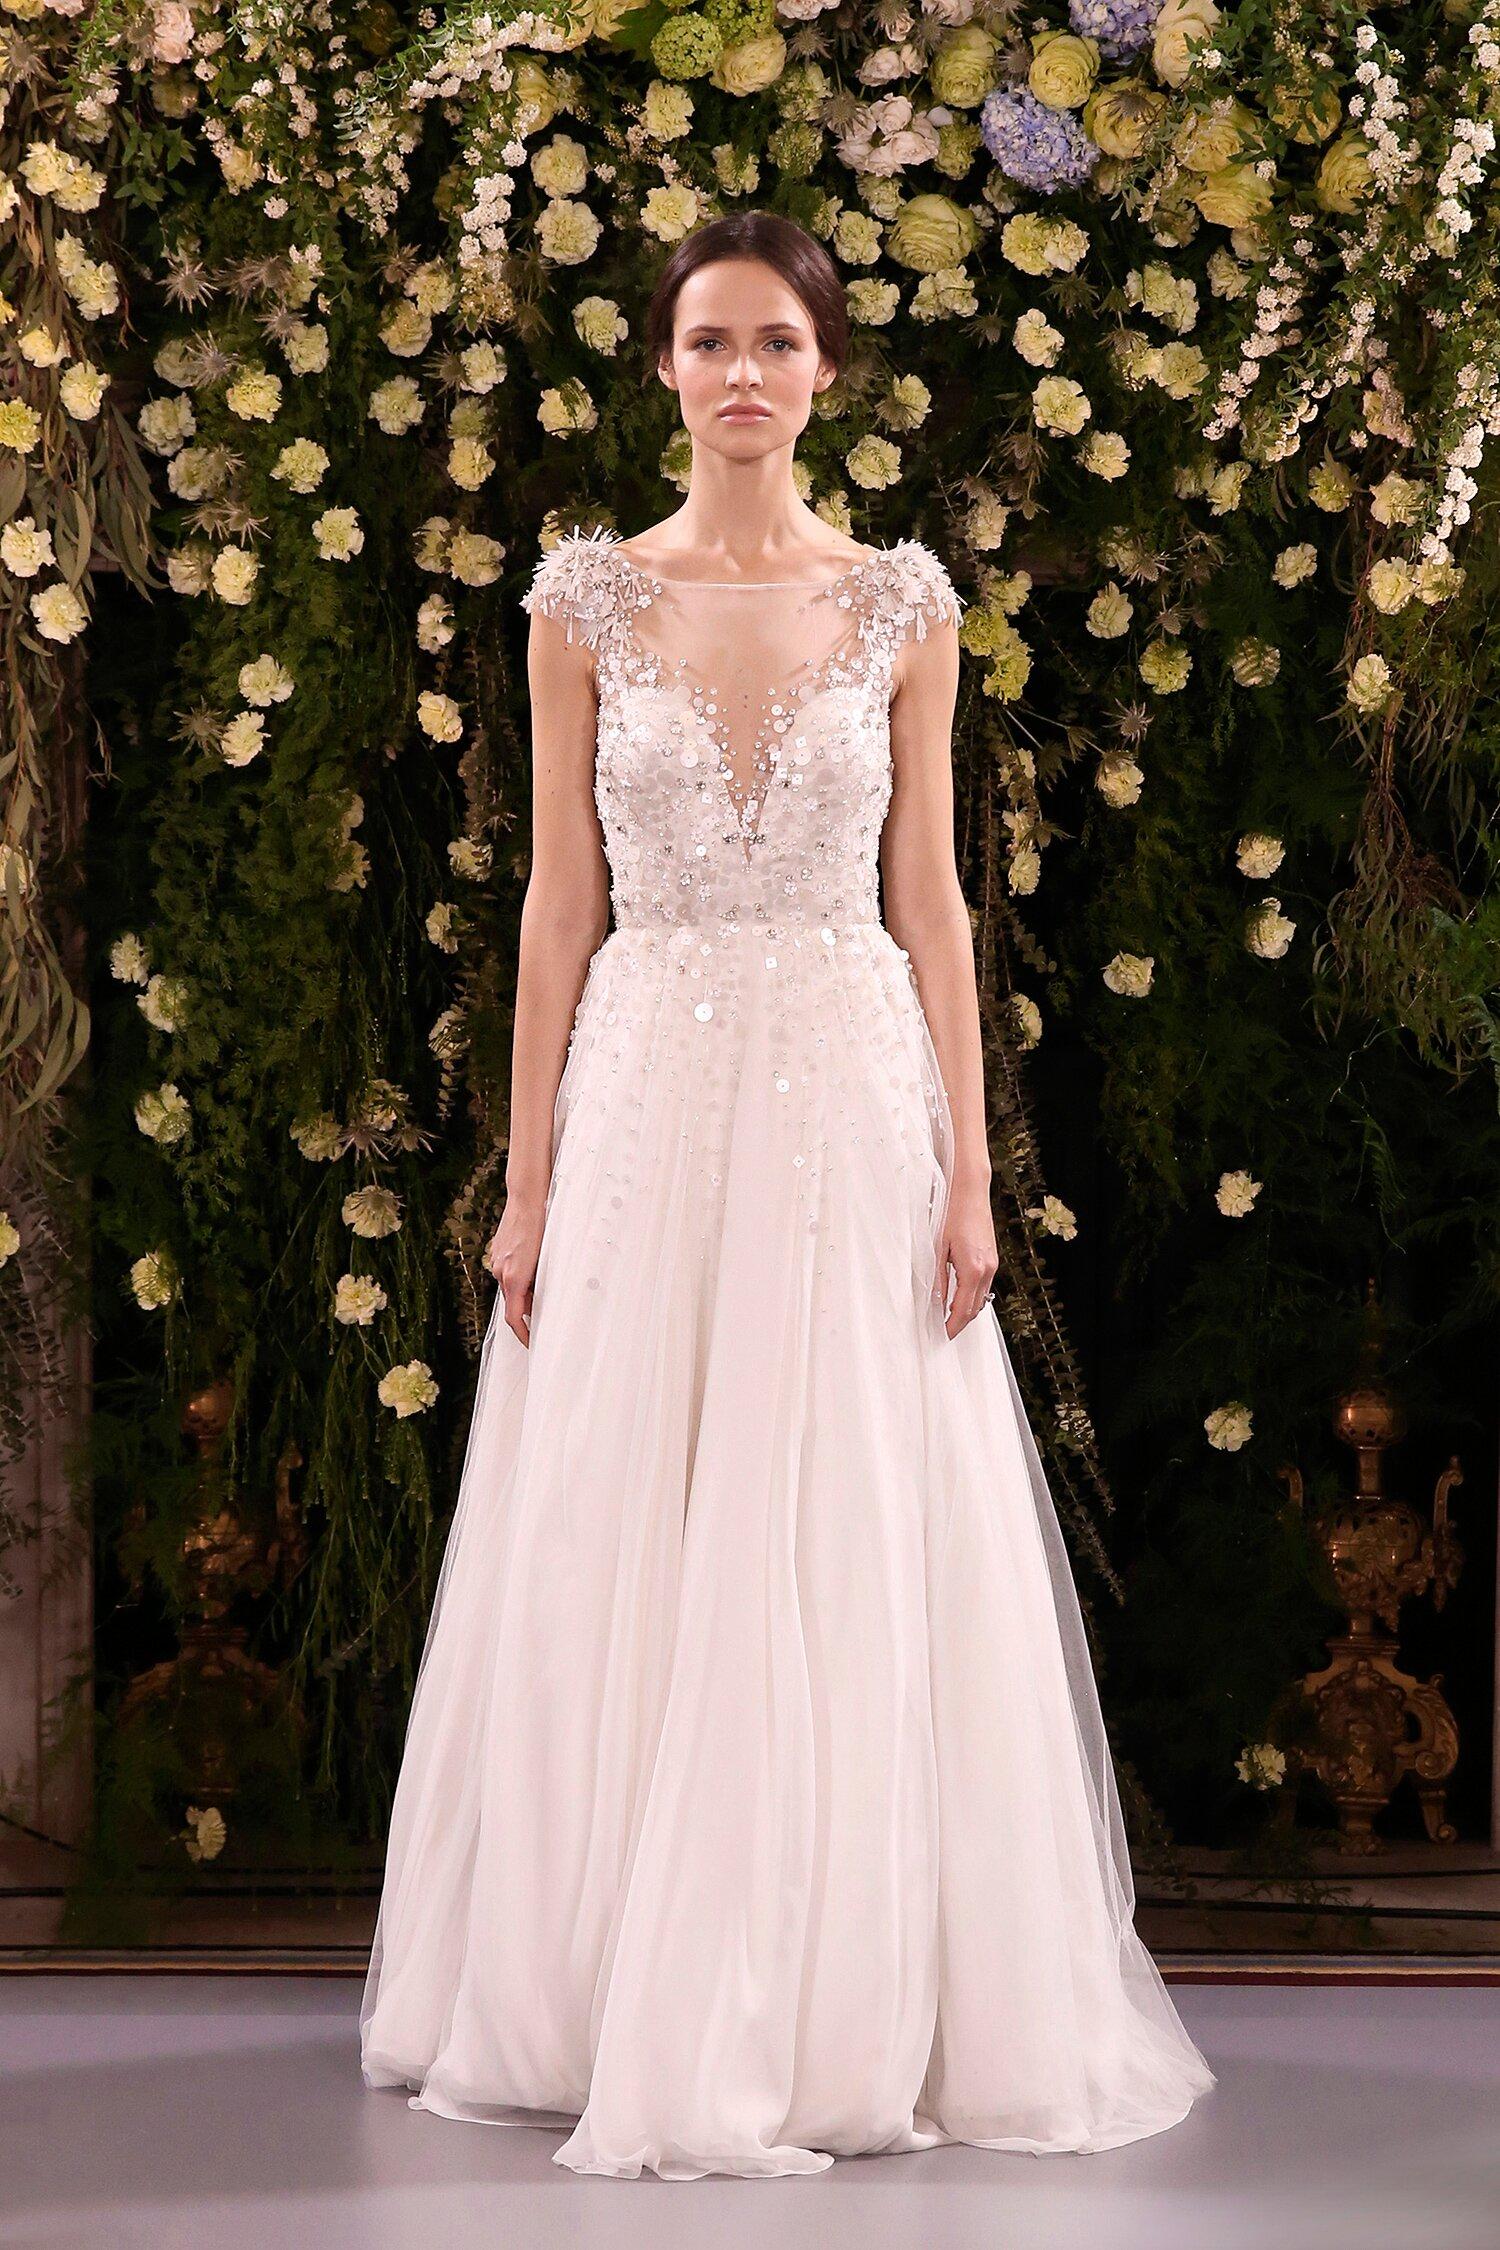 Jenny Wedding Dress Weddings Dresses